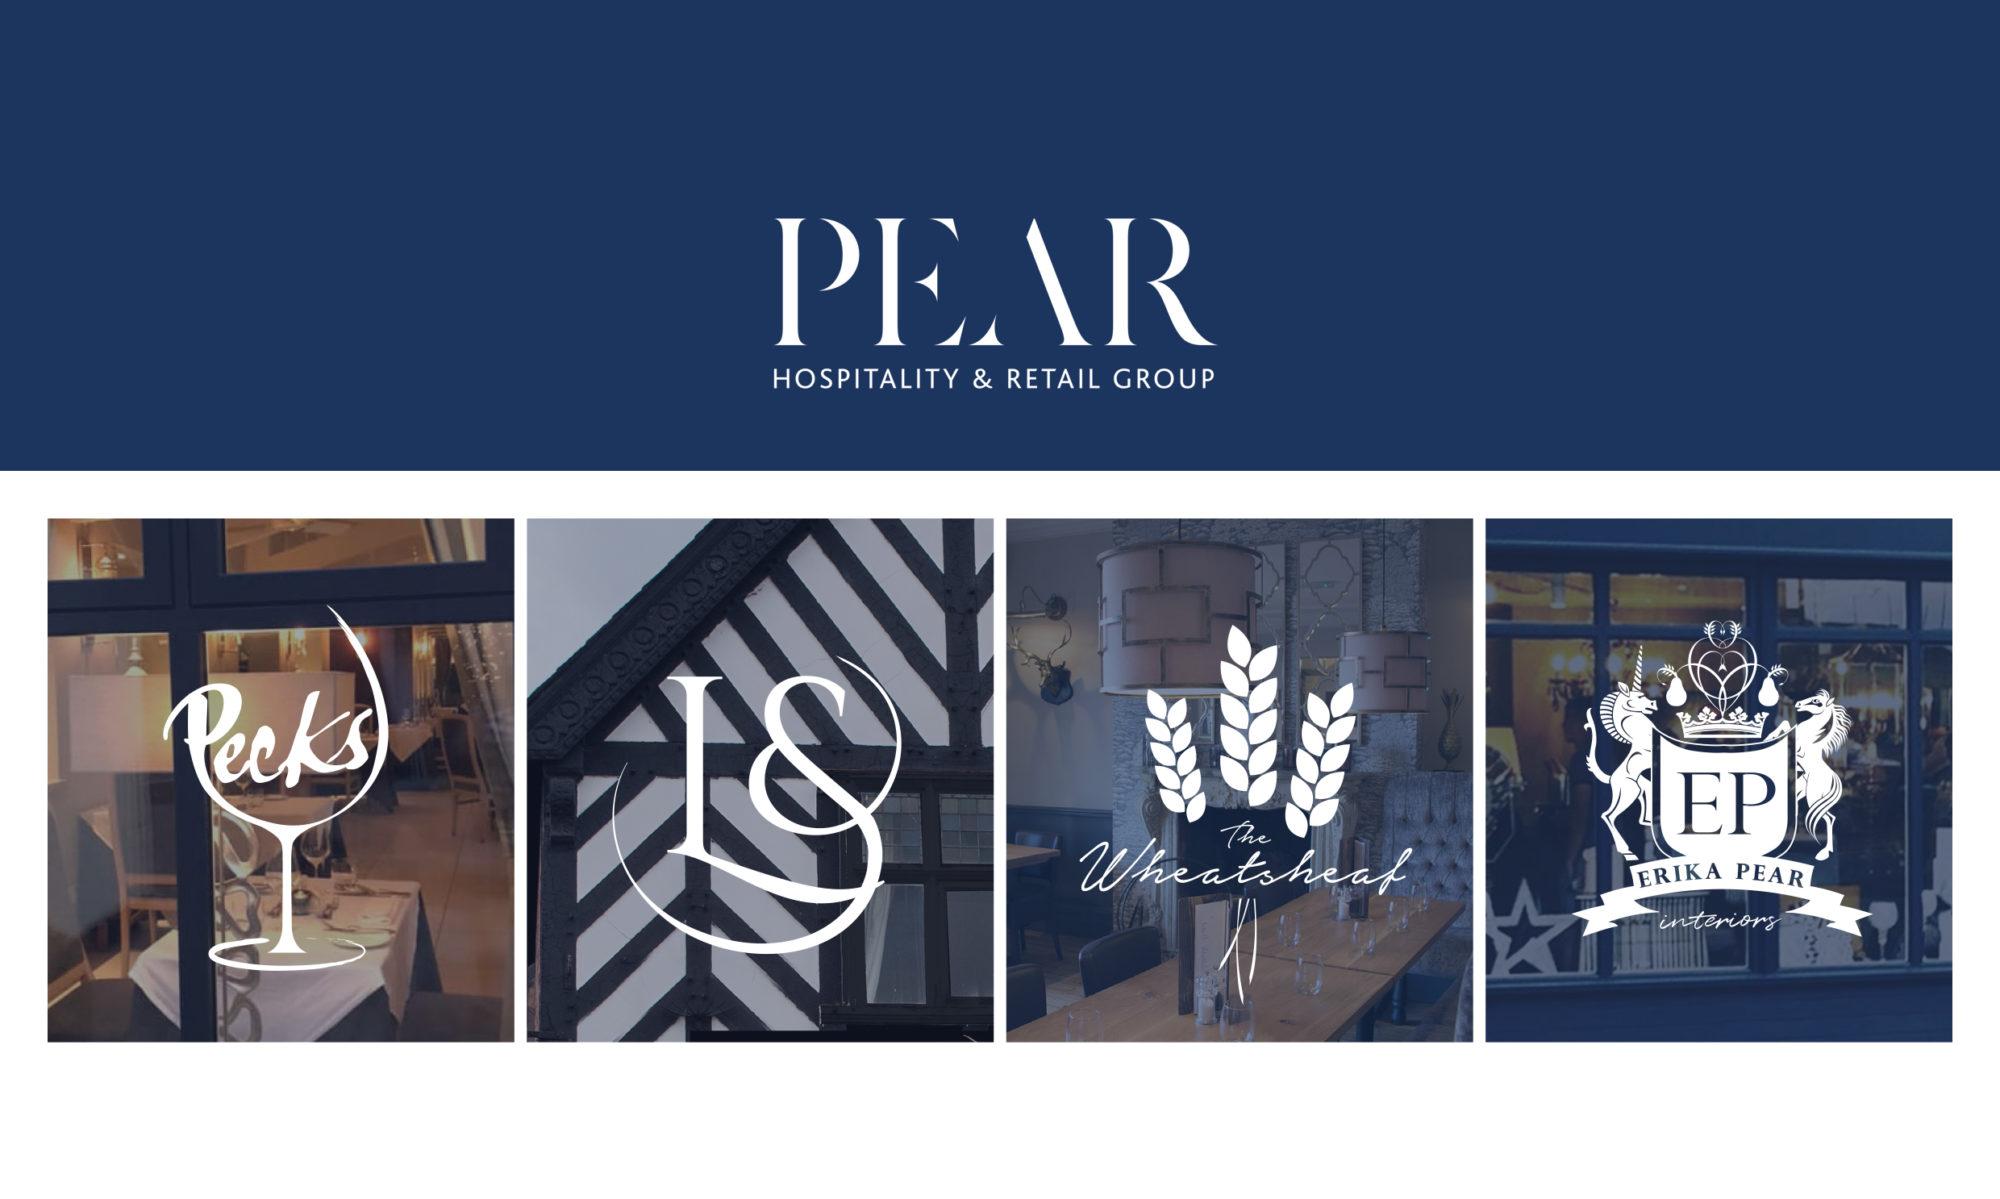 Pear Hospitality & Retail Holdings Ltd